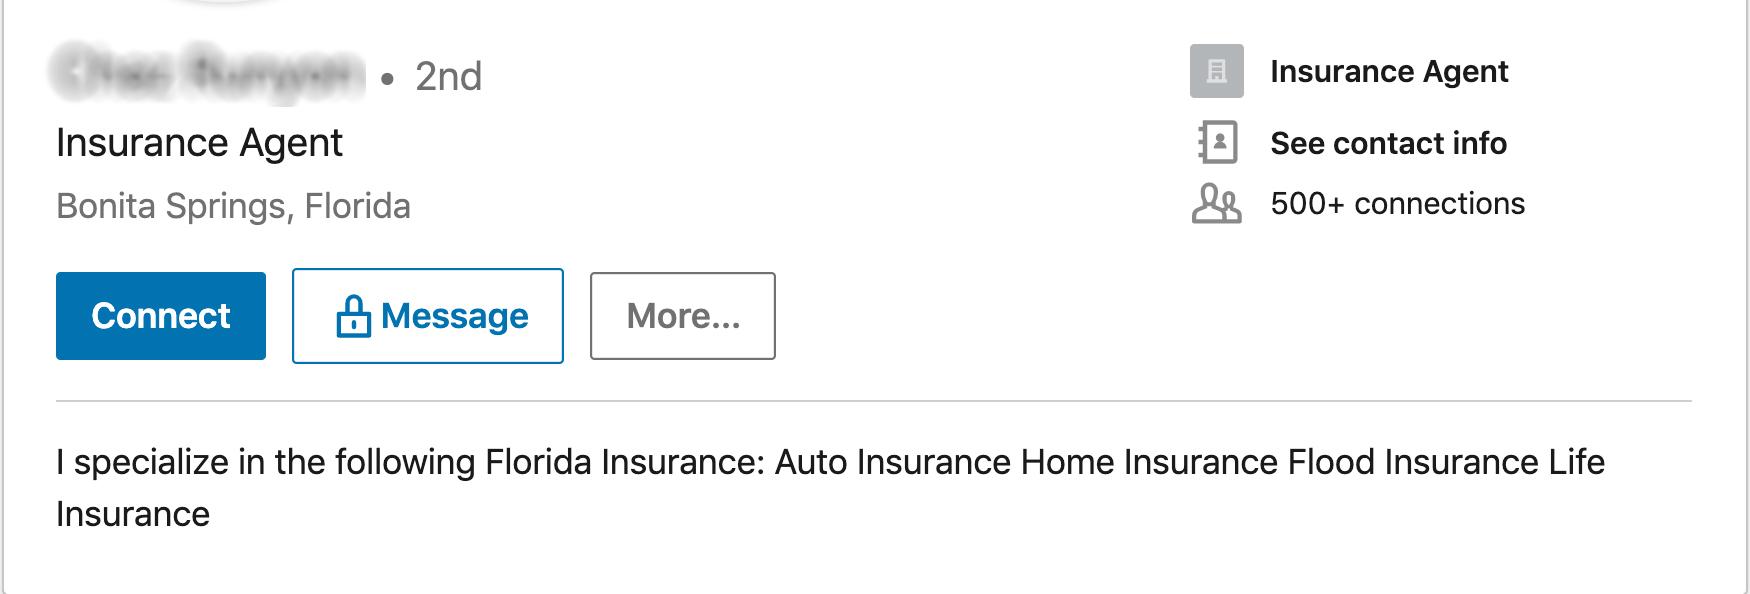 Bad-Insurance-Agent-LinkedIn-Profile-Summary-Example